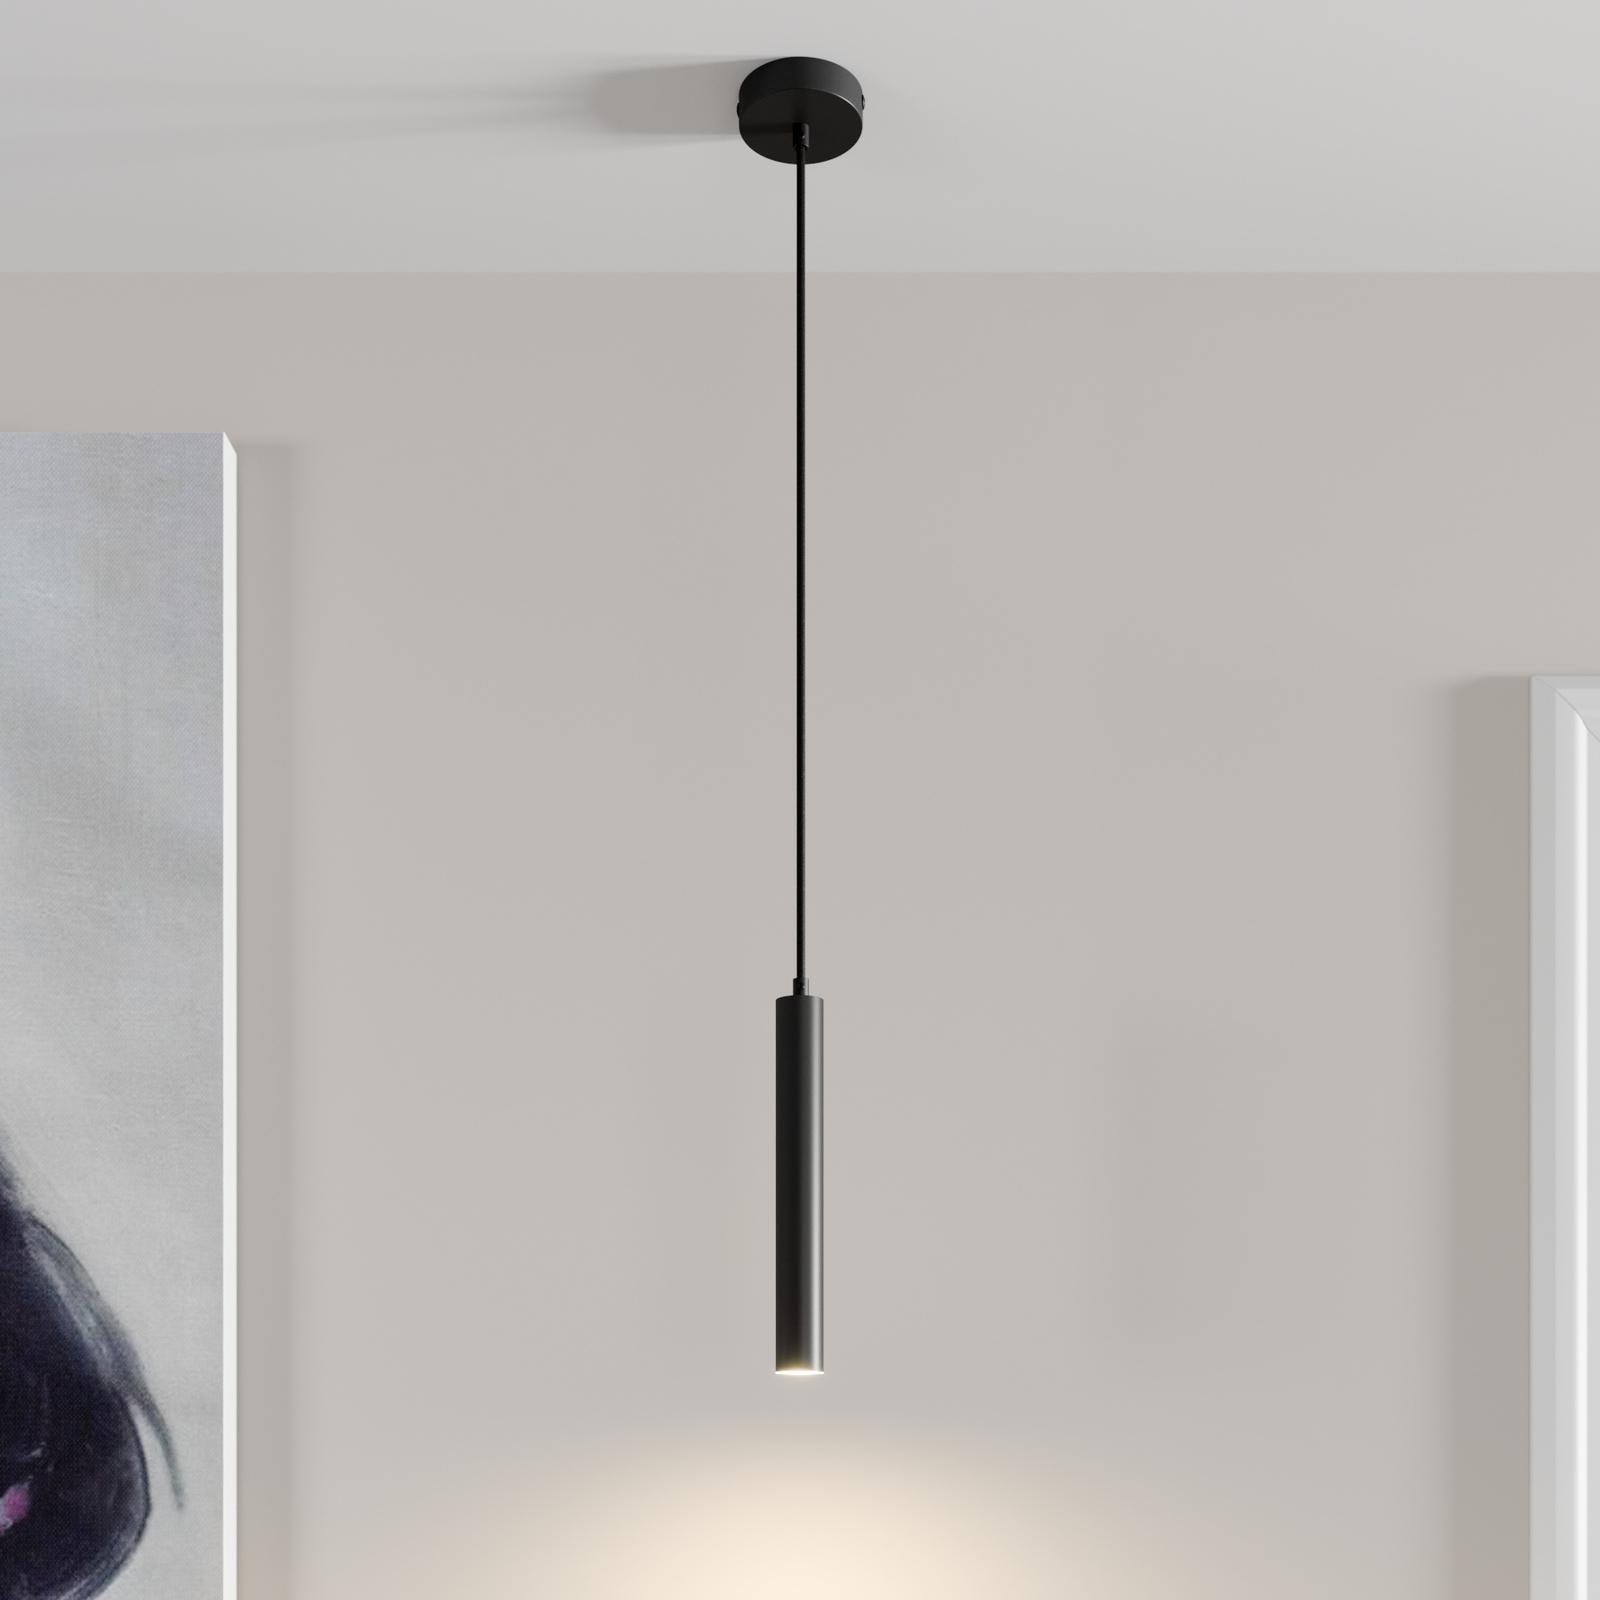 Arcchio Franka LED-Pendelleuchte, 1-flammig